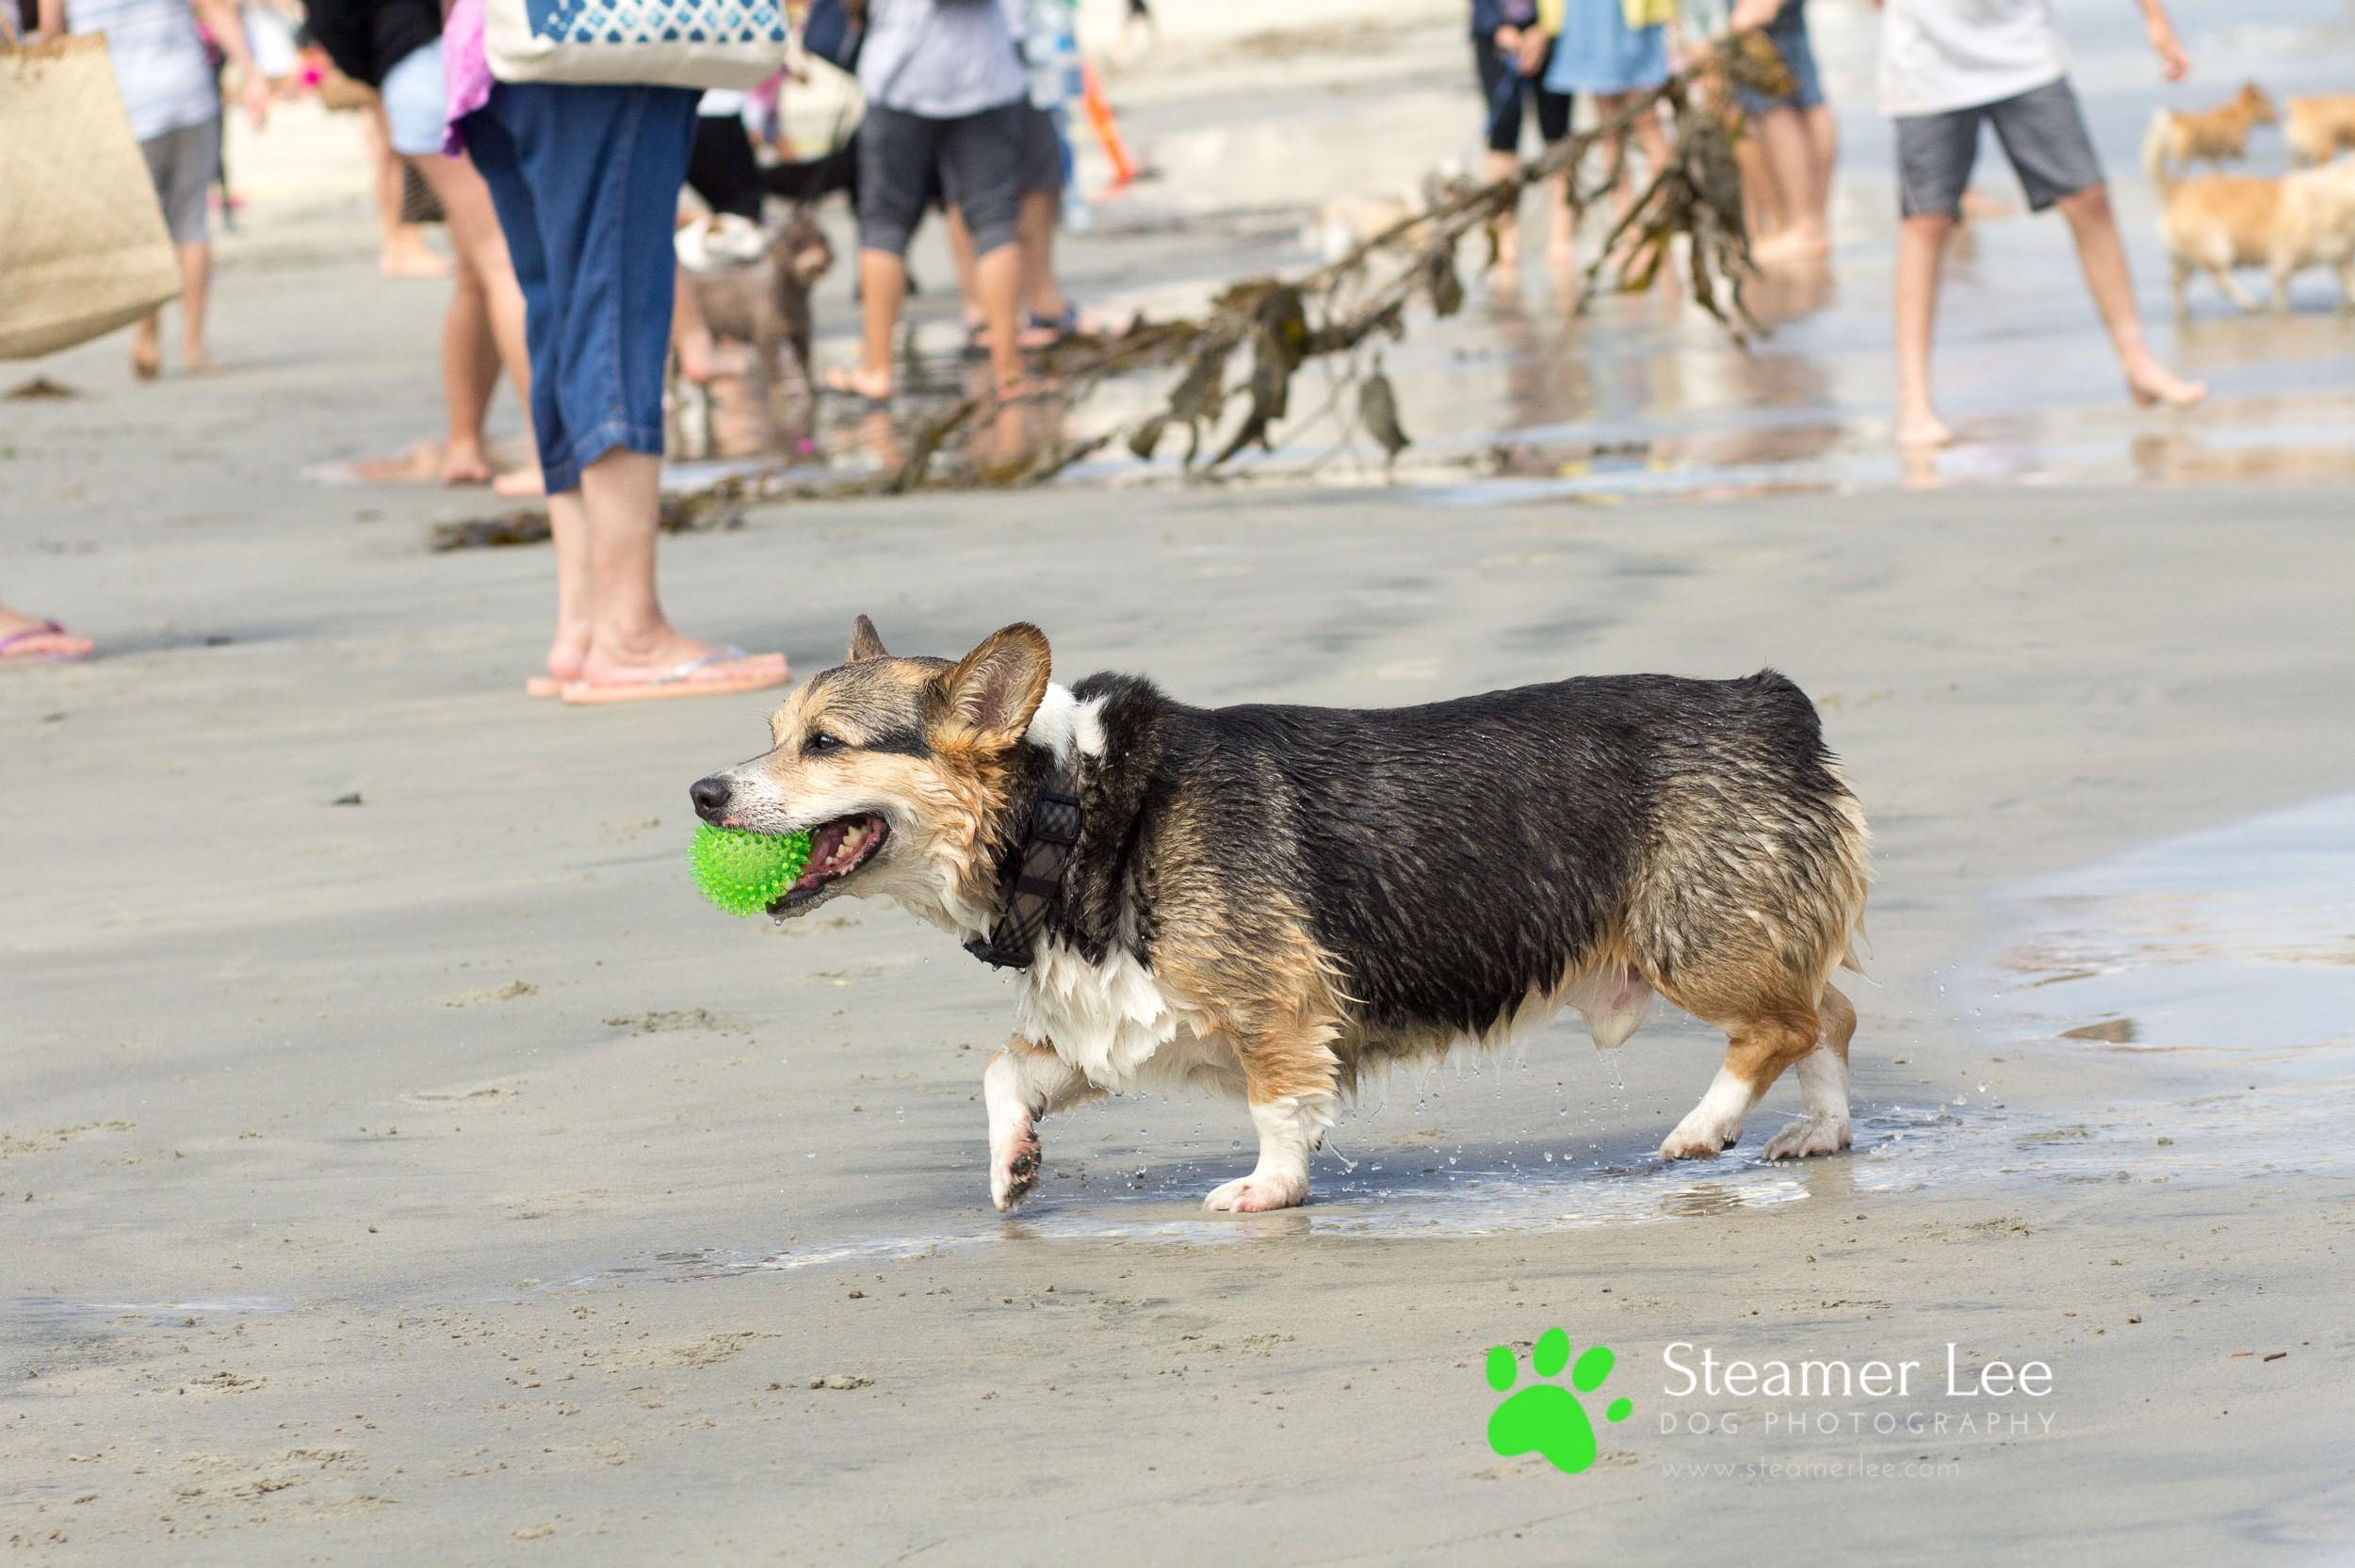 Steamer Lee Dog Photography - July 2017 So Cal Corgi Beach Day - Vol. 3 - 24.jpg